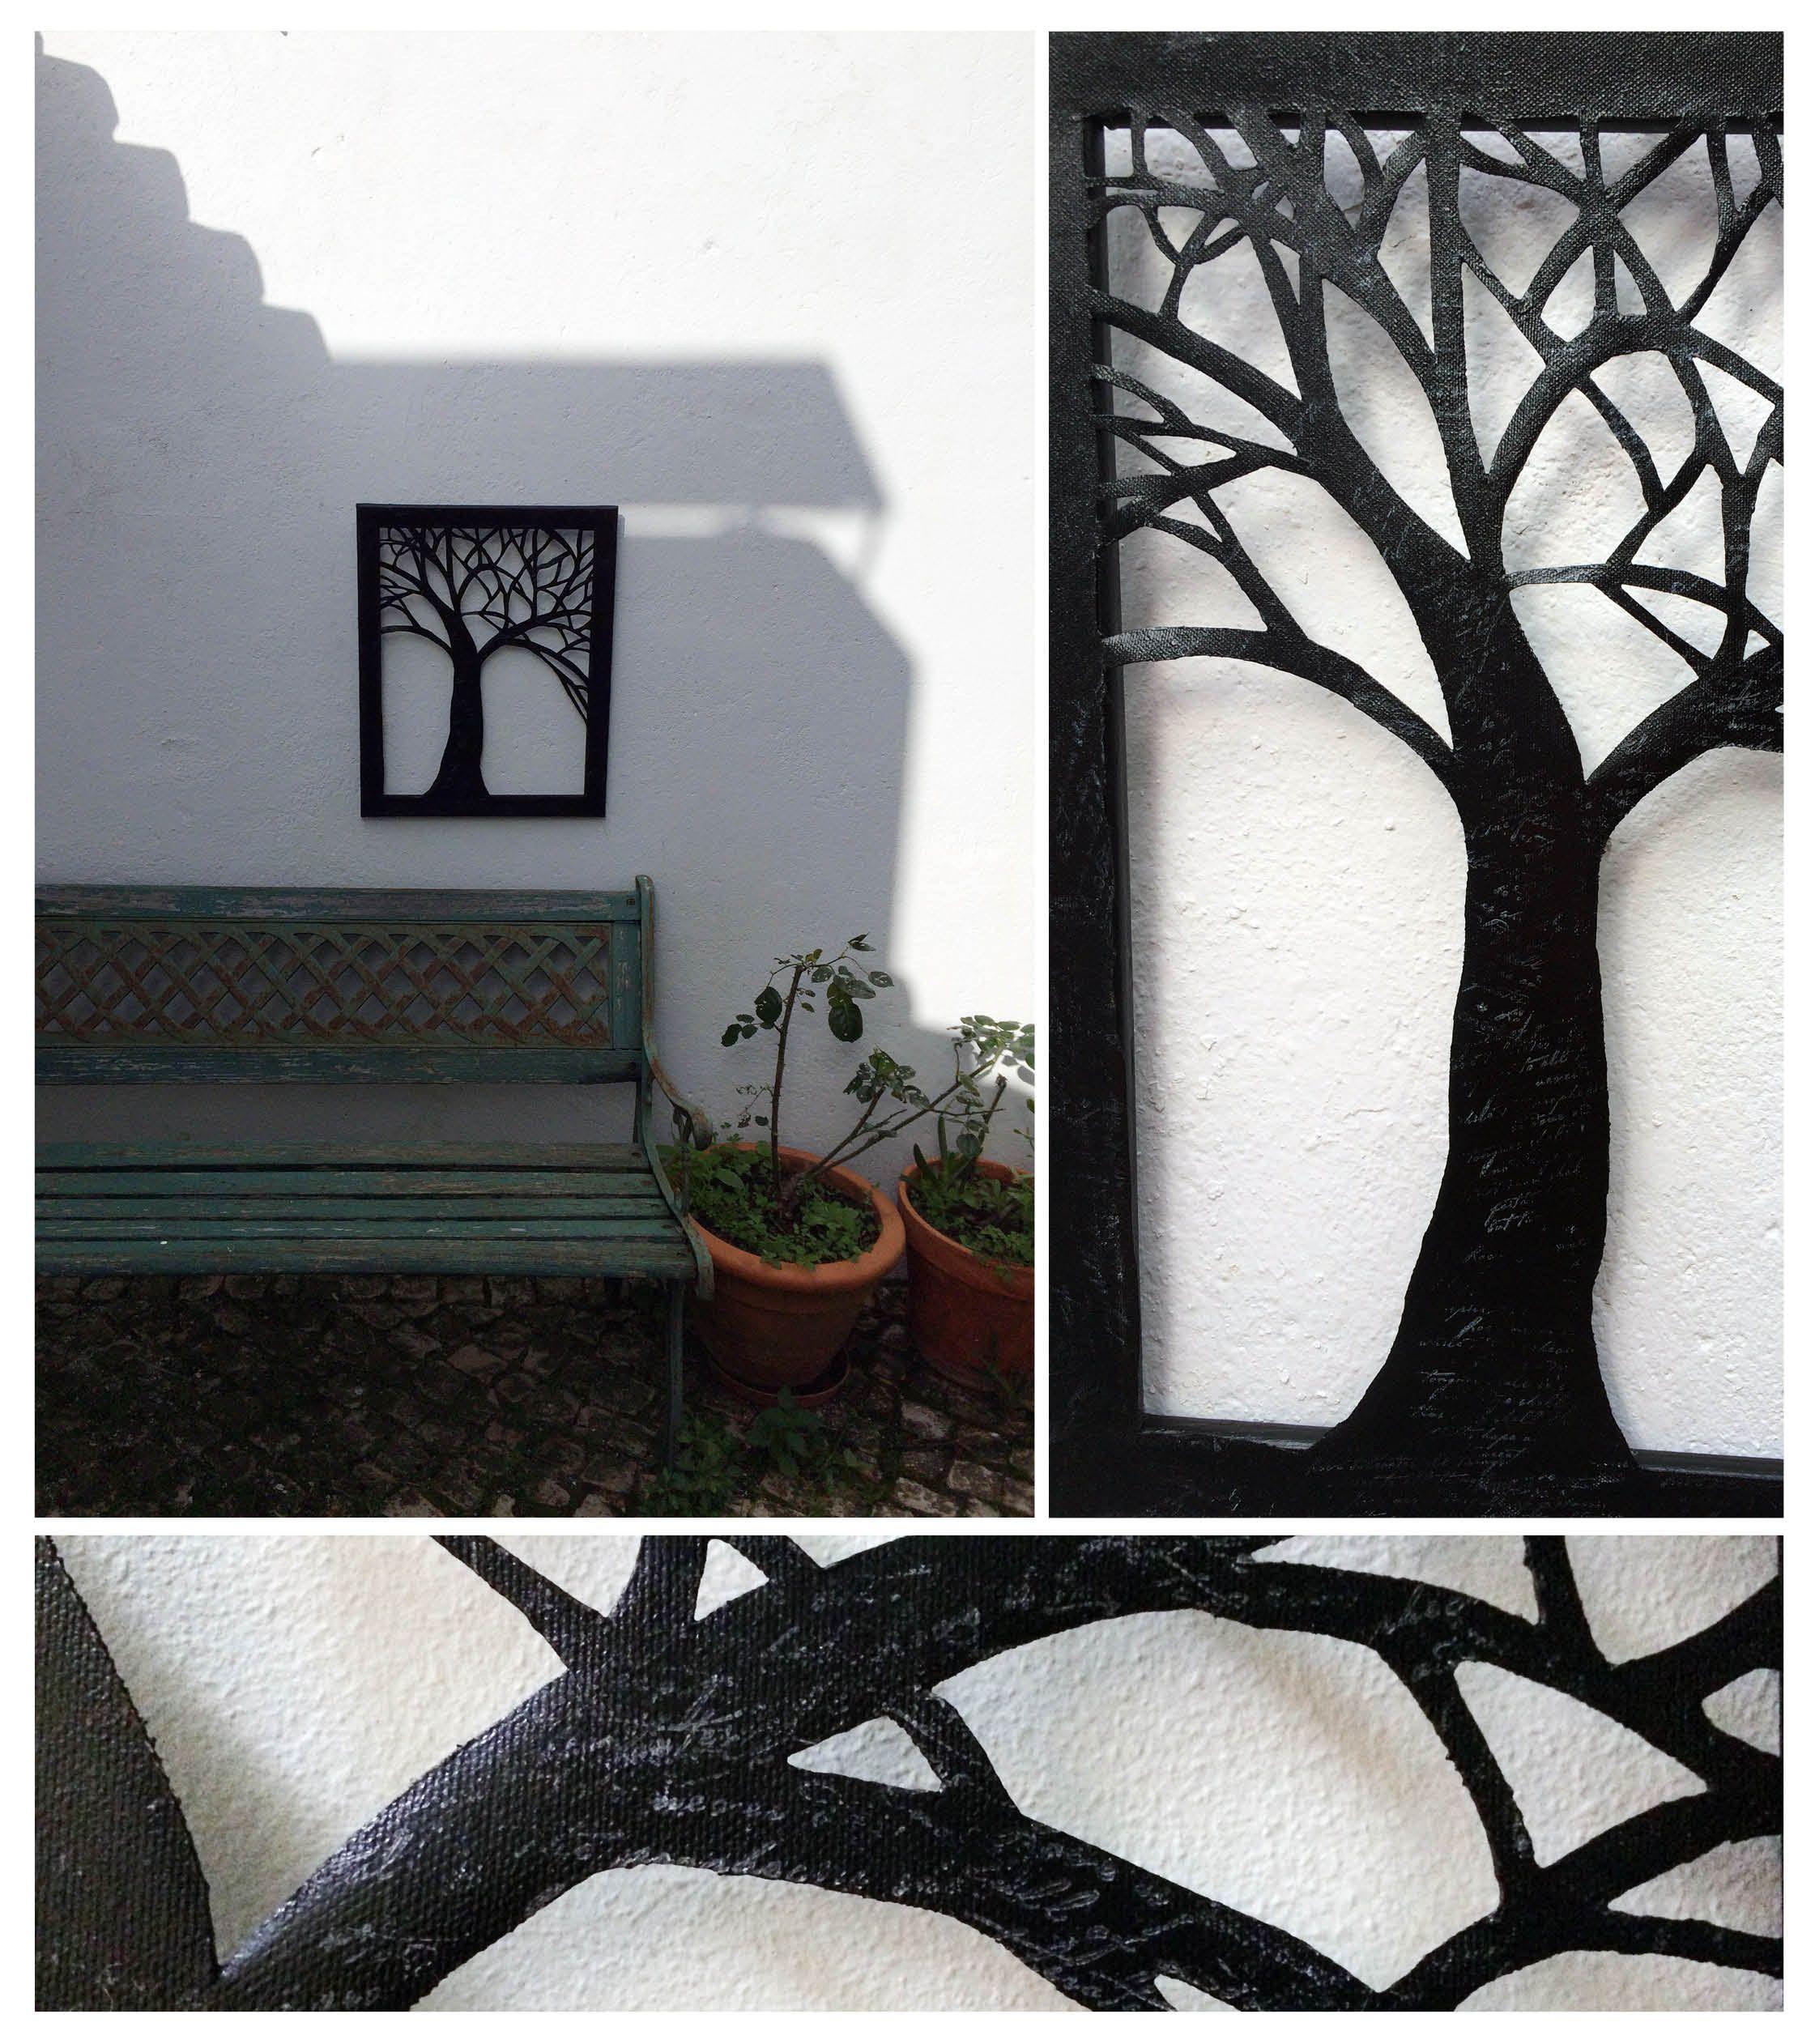 Tela recordada e pintada. A árvore da vida...